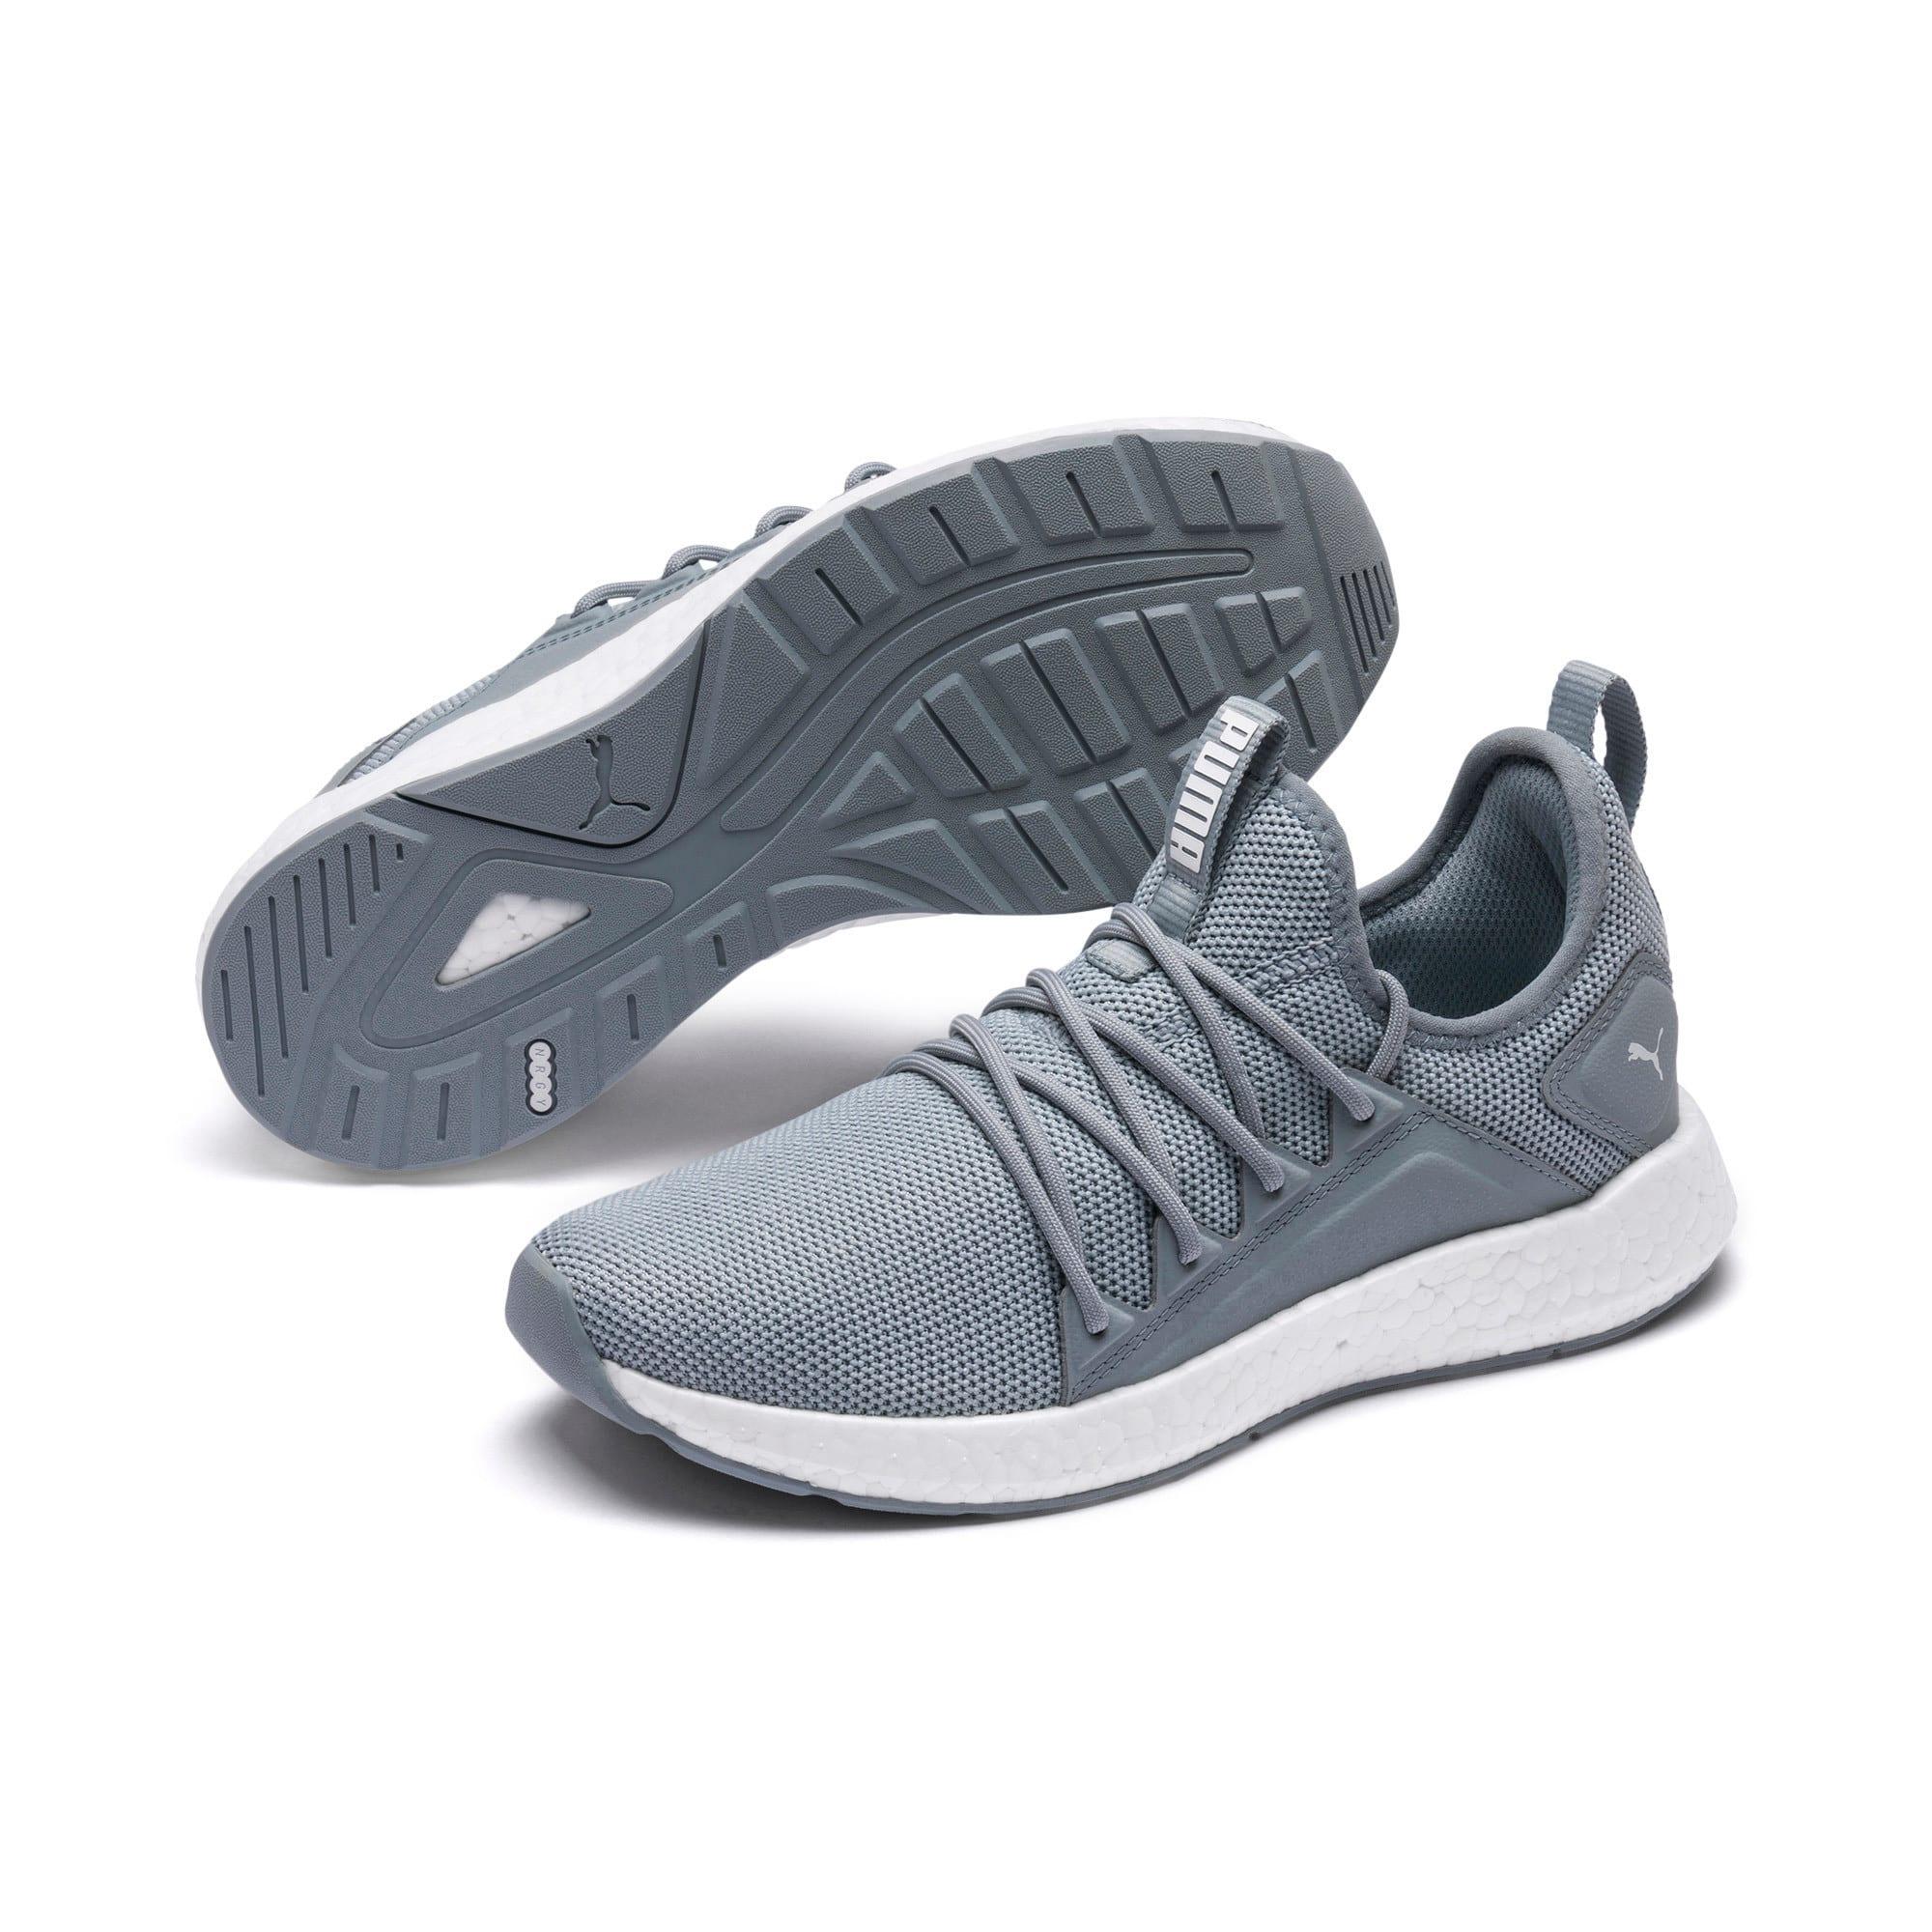 Thumbnail 2 of NRGY Neko Women's Running Shoes, Quarry-Puma White, medium